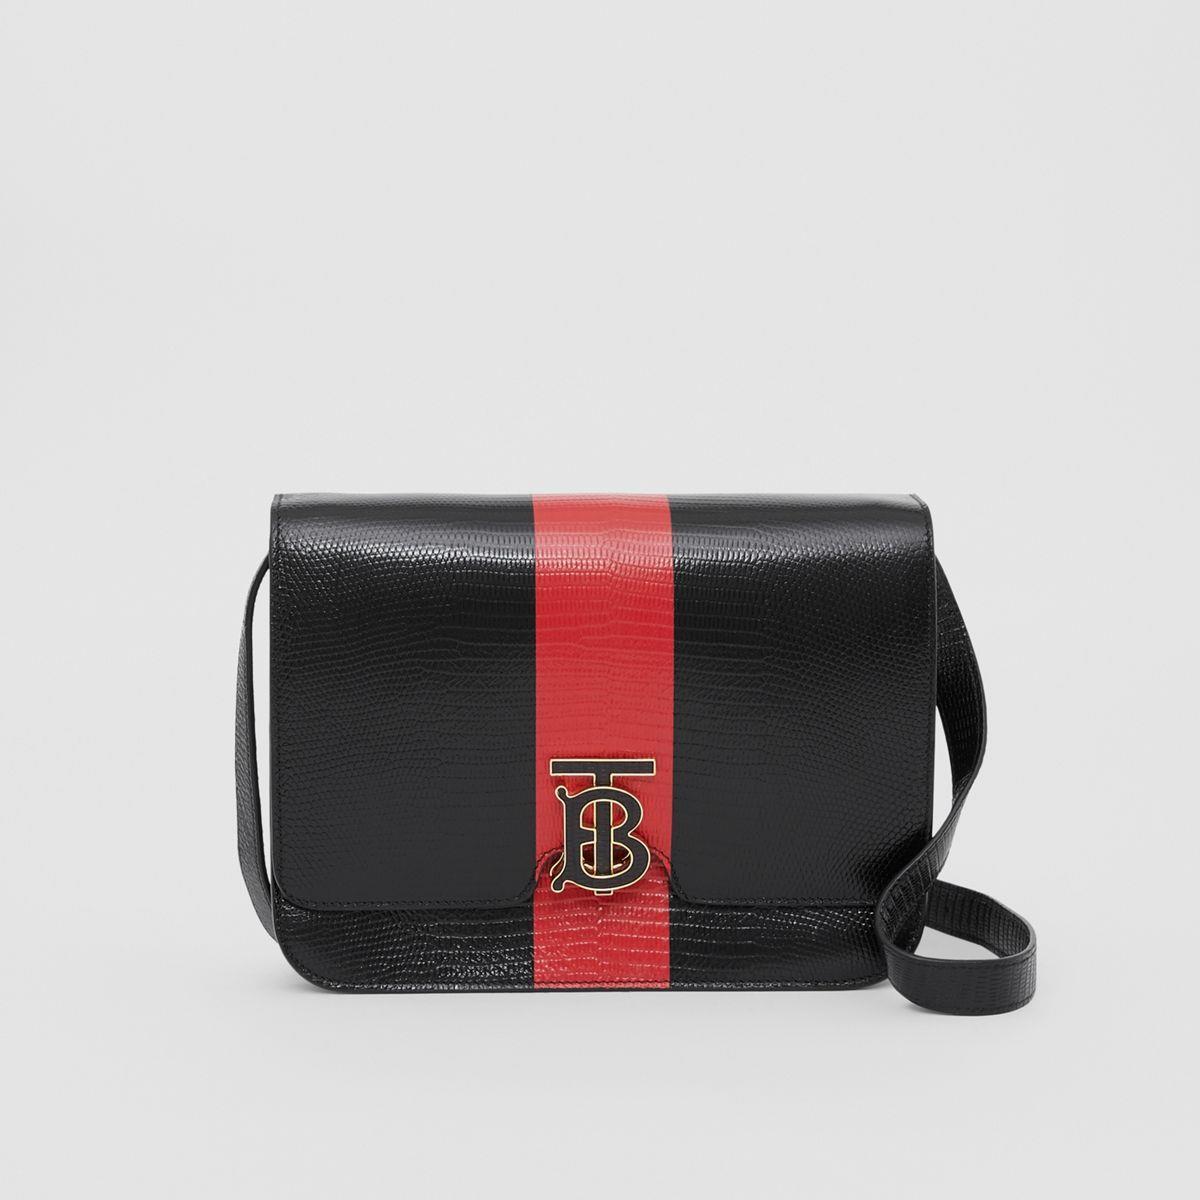 Medium Striped Embossed Leather TB Bag